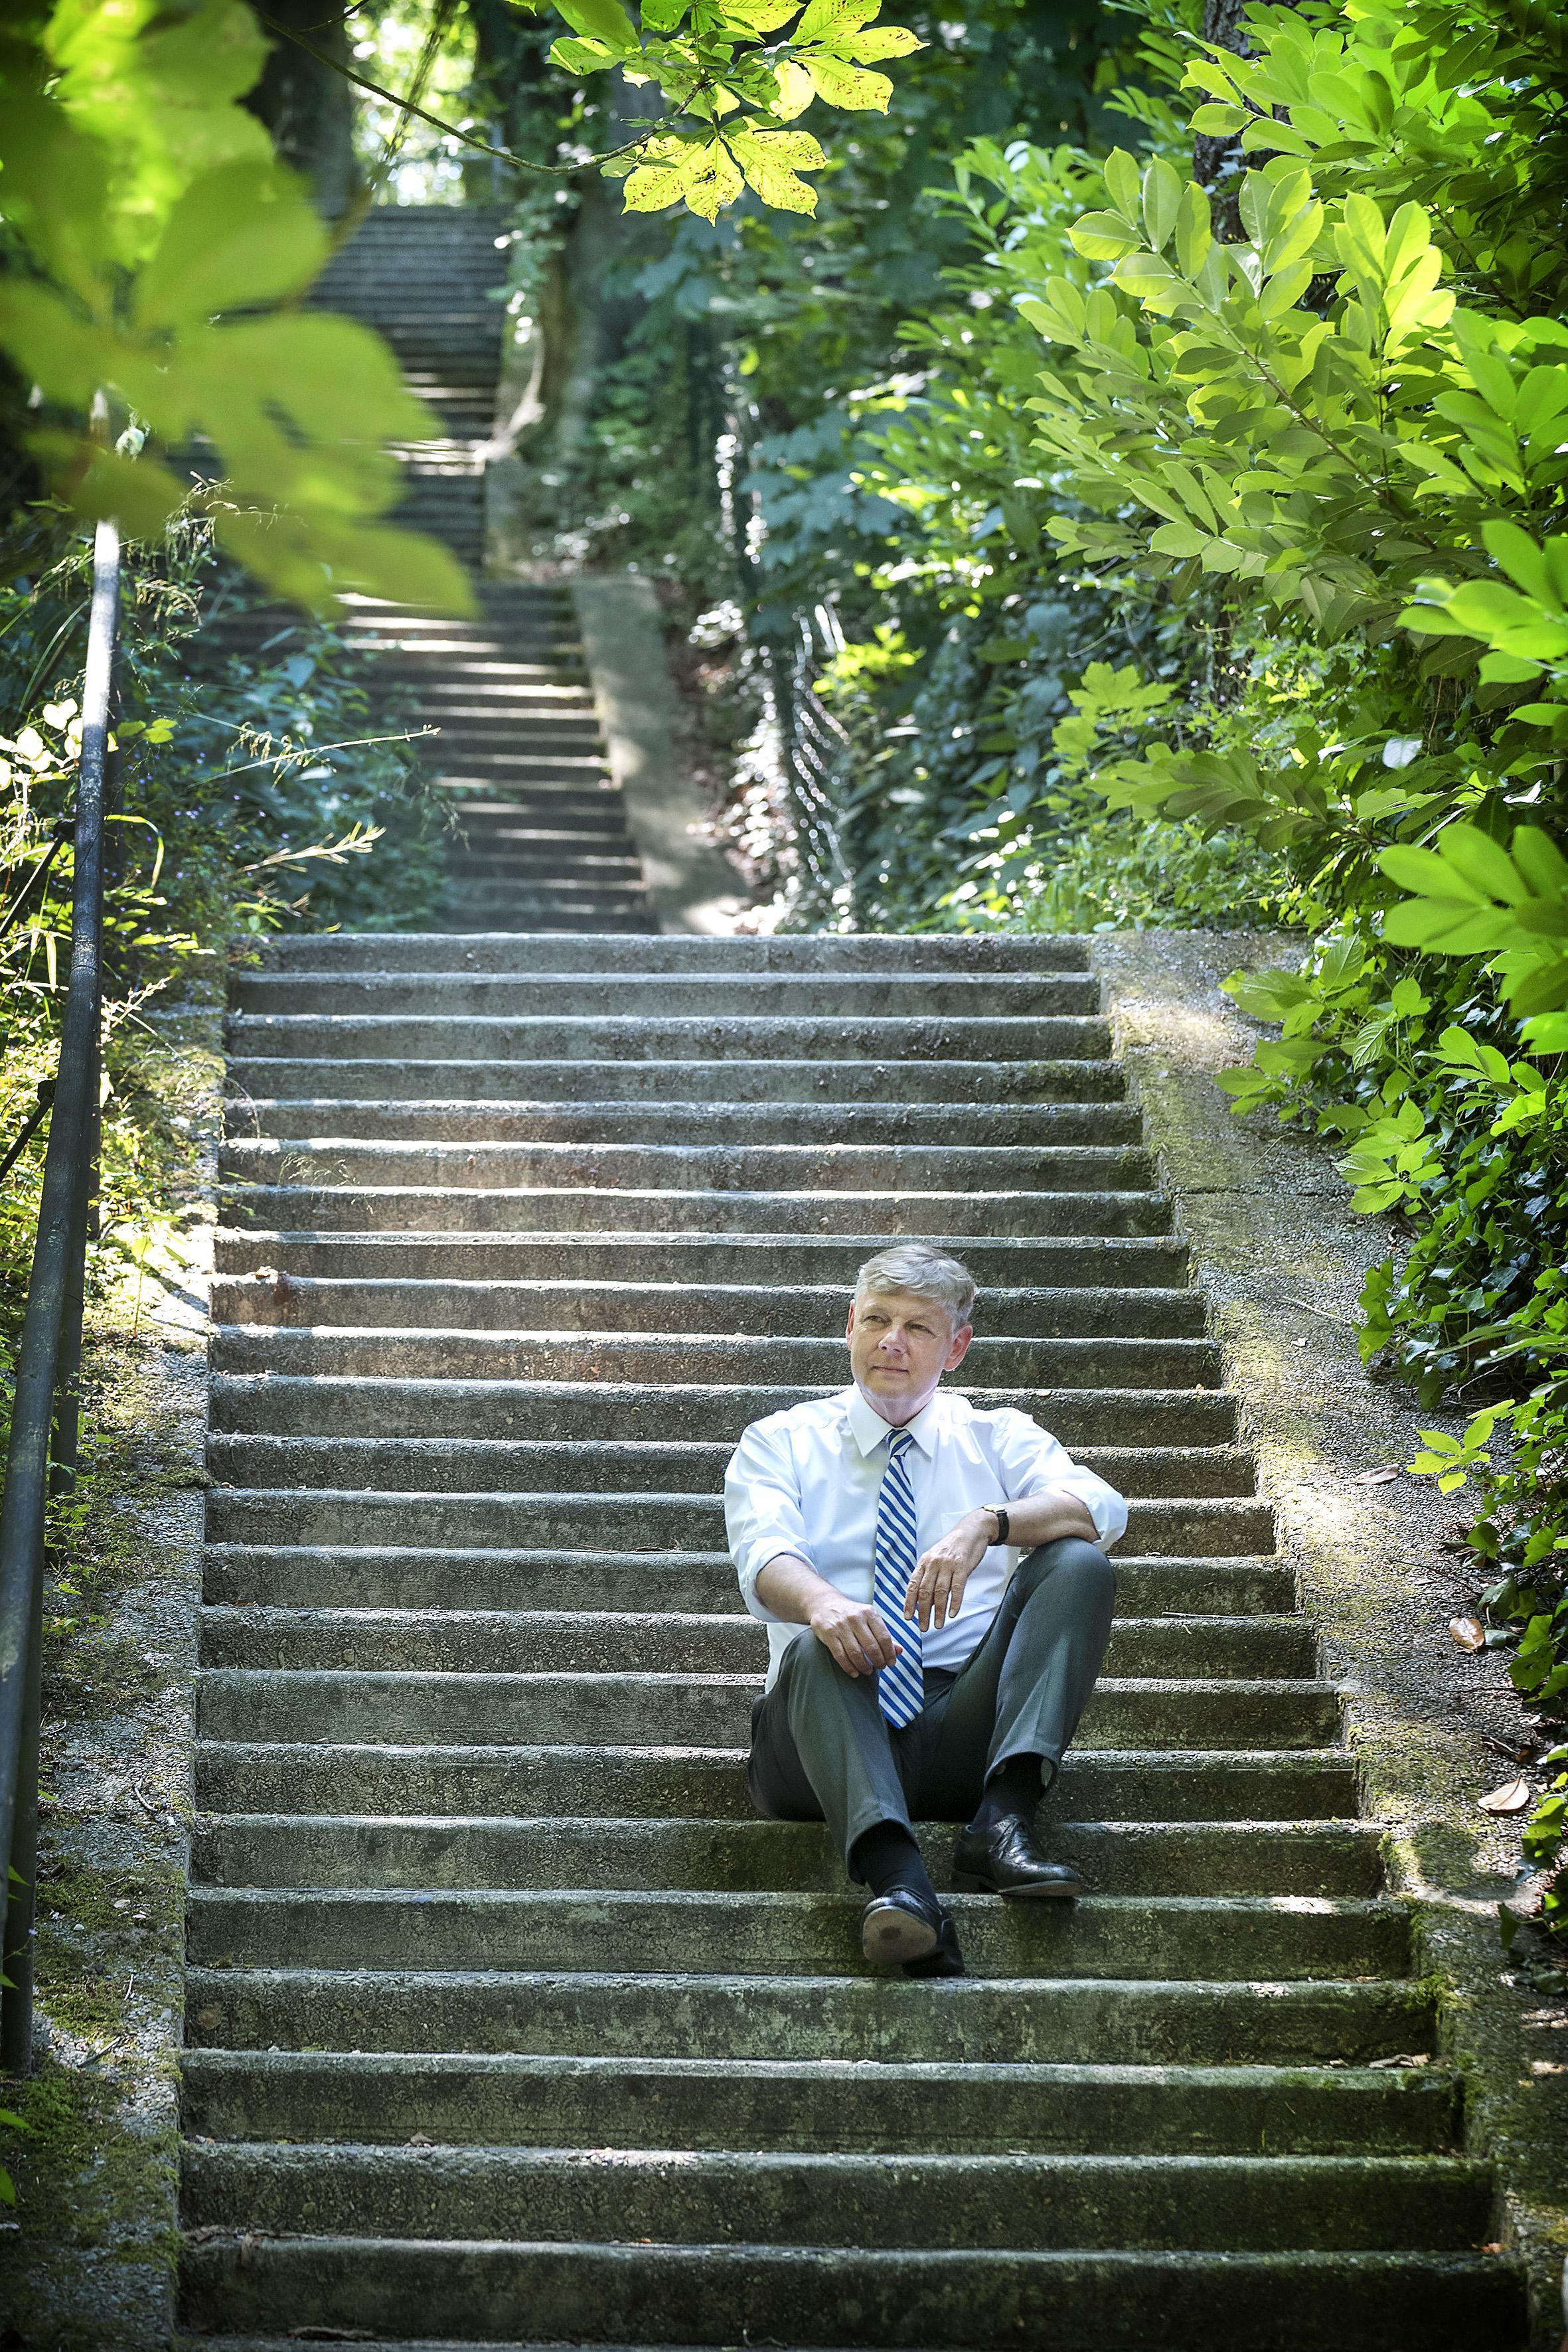 Bloemendaalse raad vindt burgemeester Roest integer